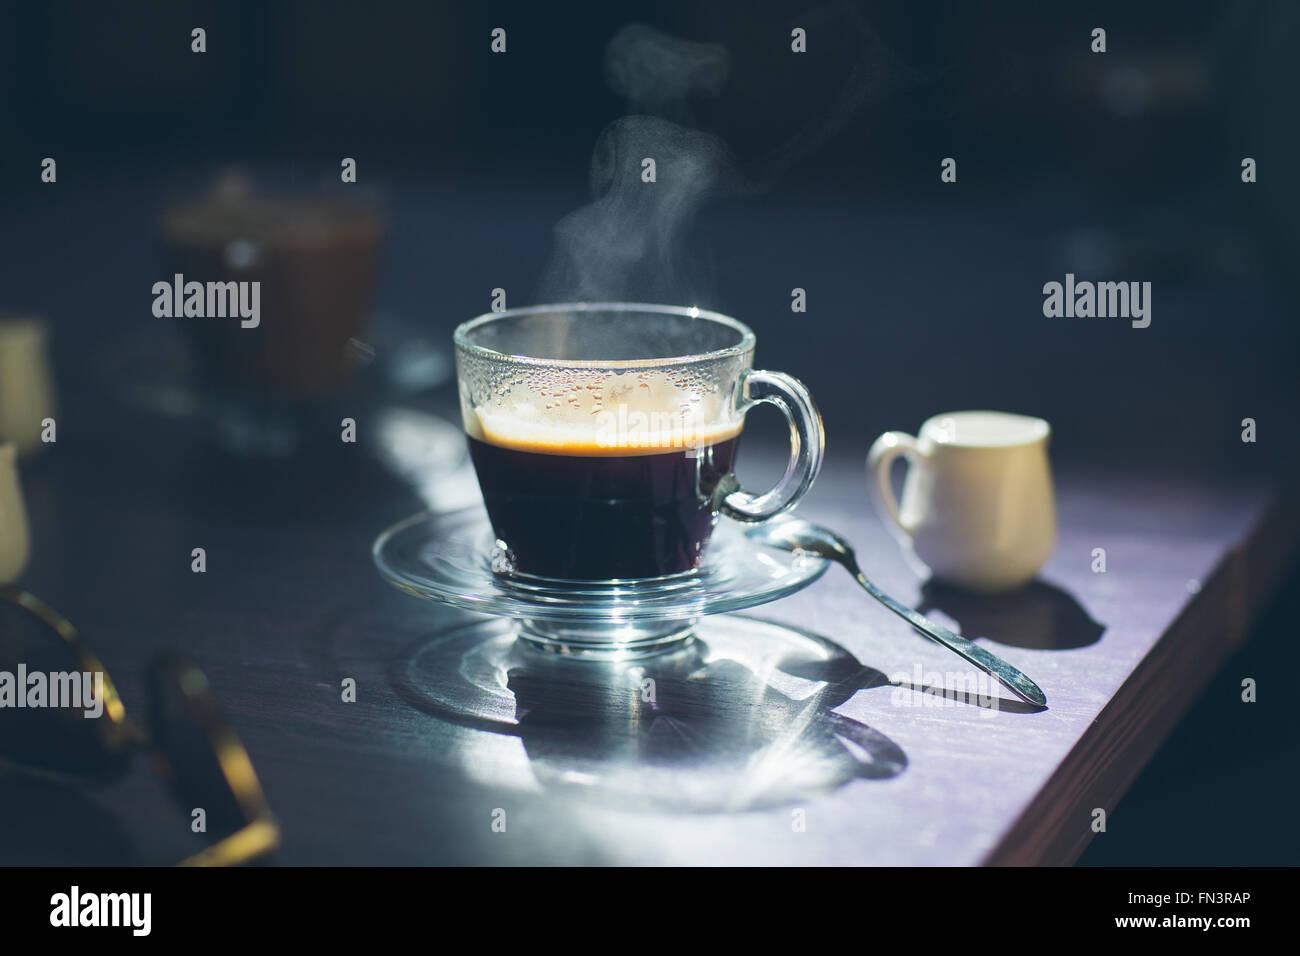 Taza de café caliente sobre la mesa Imagen De Stock